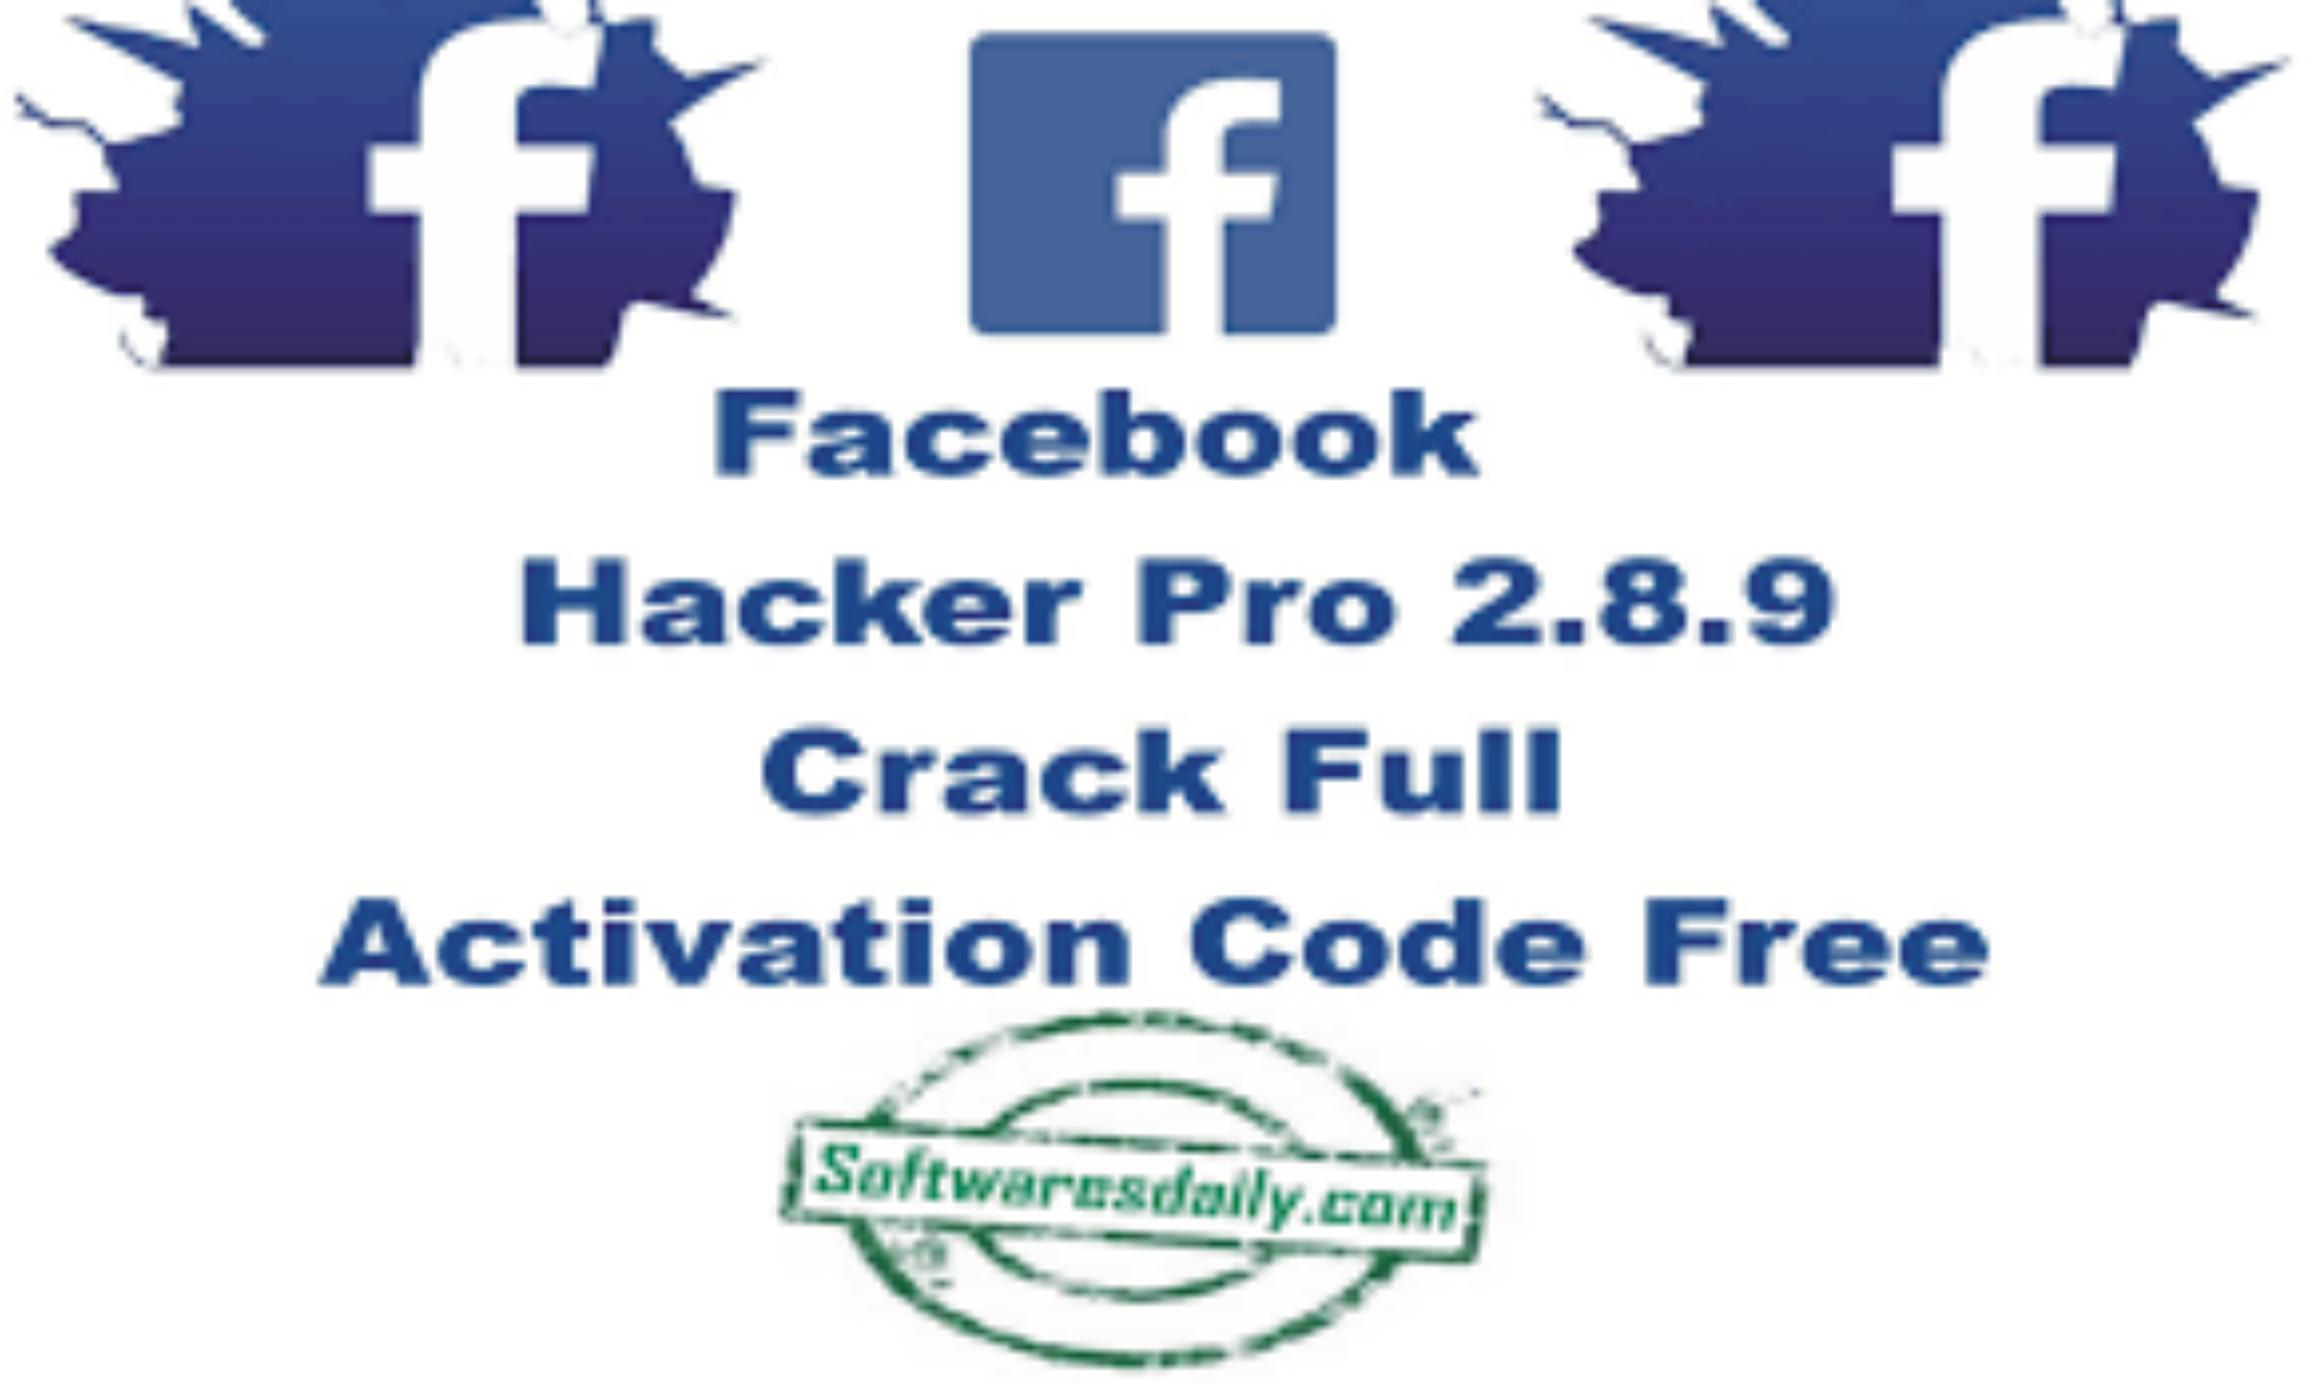 Facebook Hacker Pro 2.8.9 Crack Full Activation Code Free